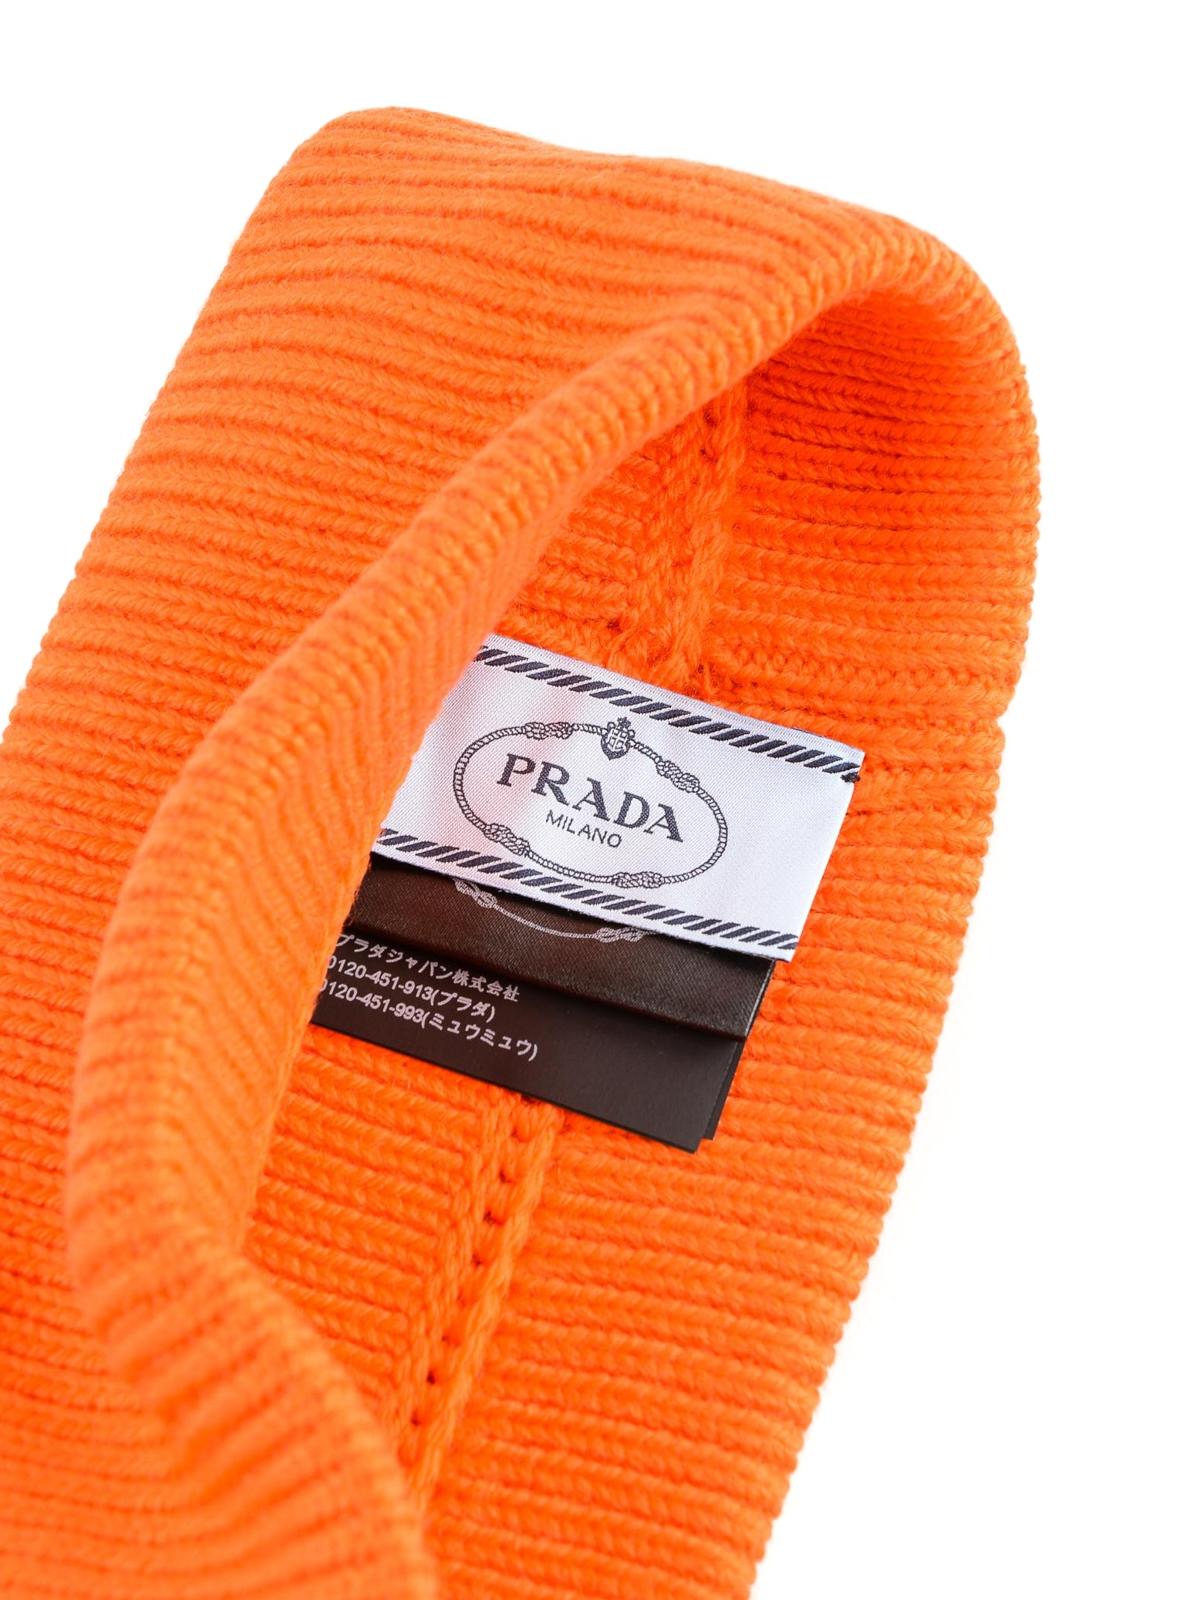 571fe8d25f8 Prada - Orange logo patch wool beanie - beanies - 27379.MPG 049